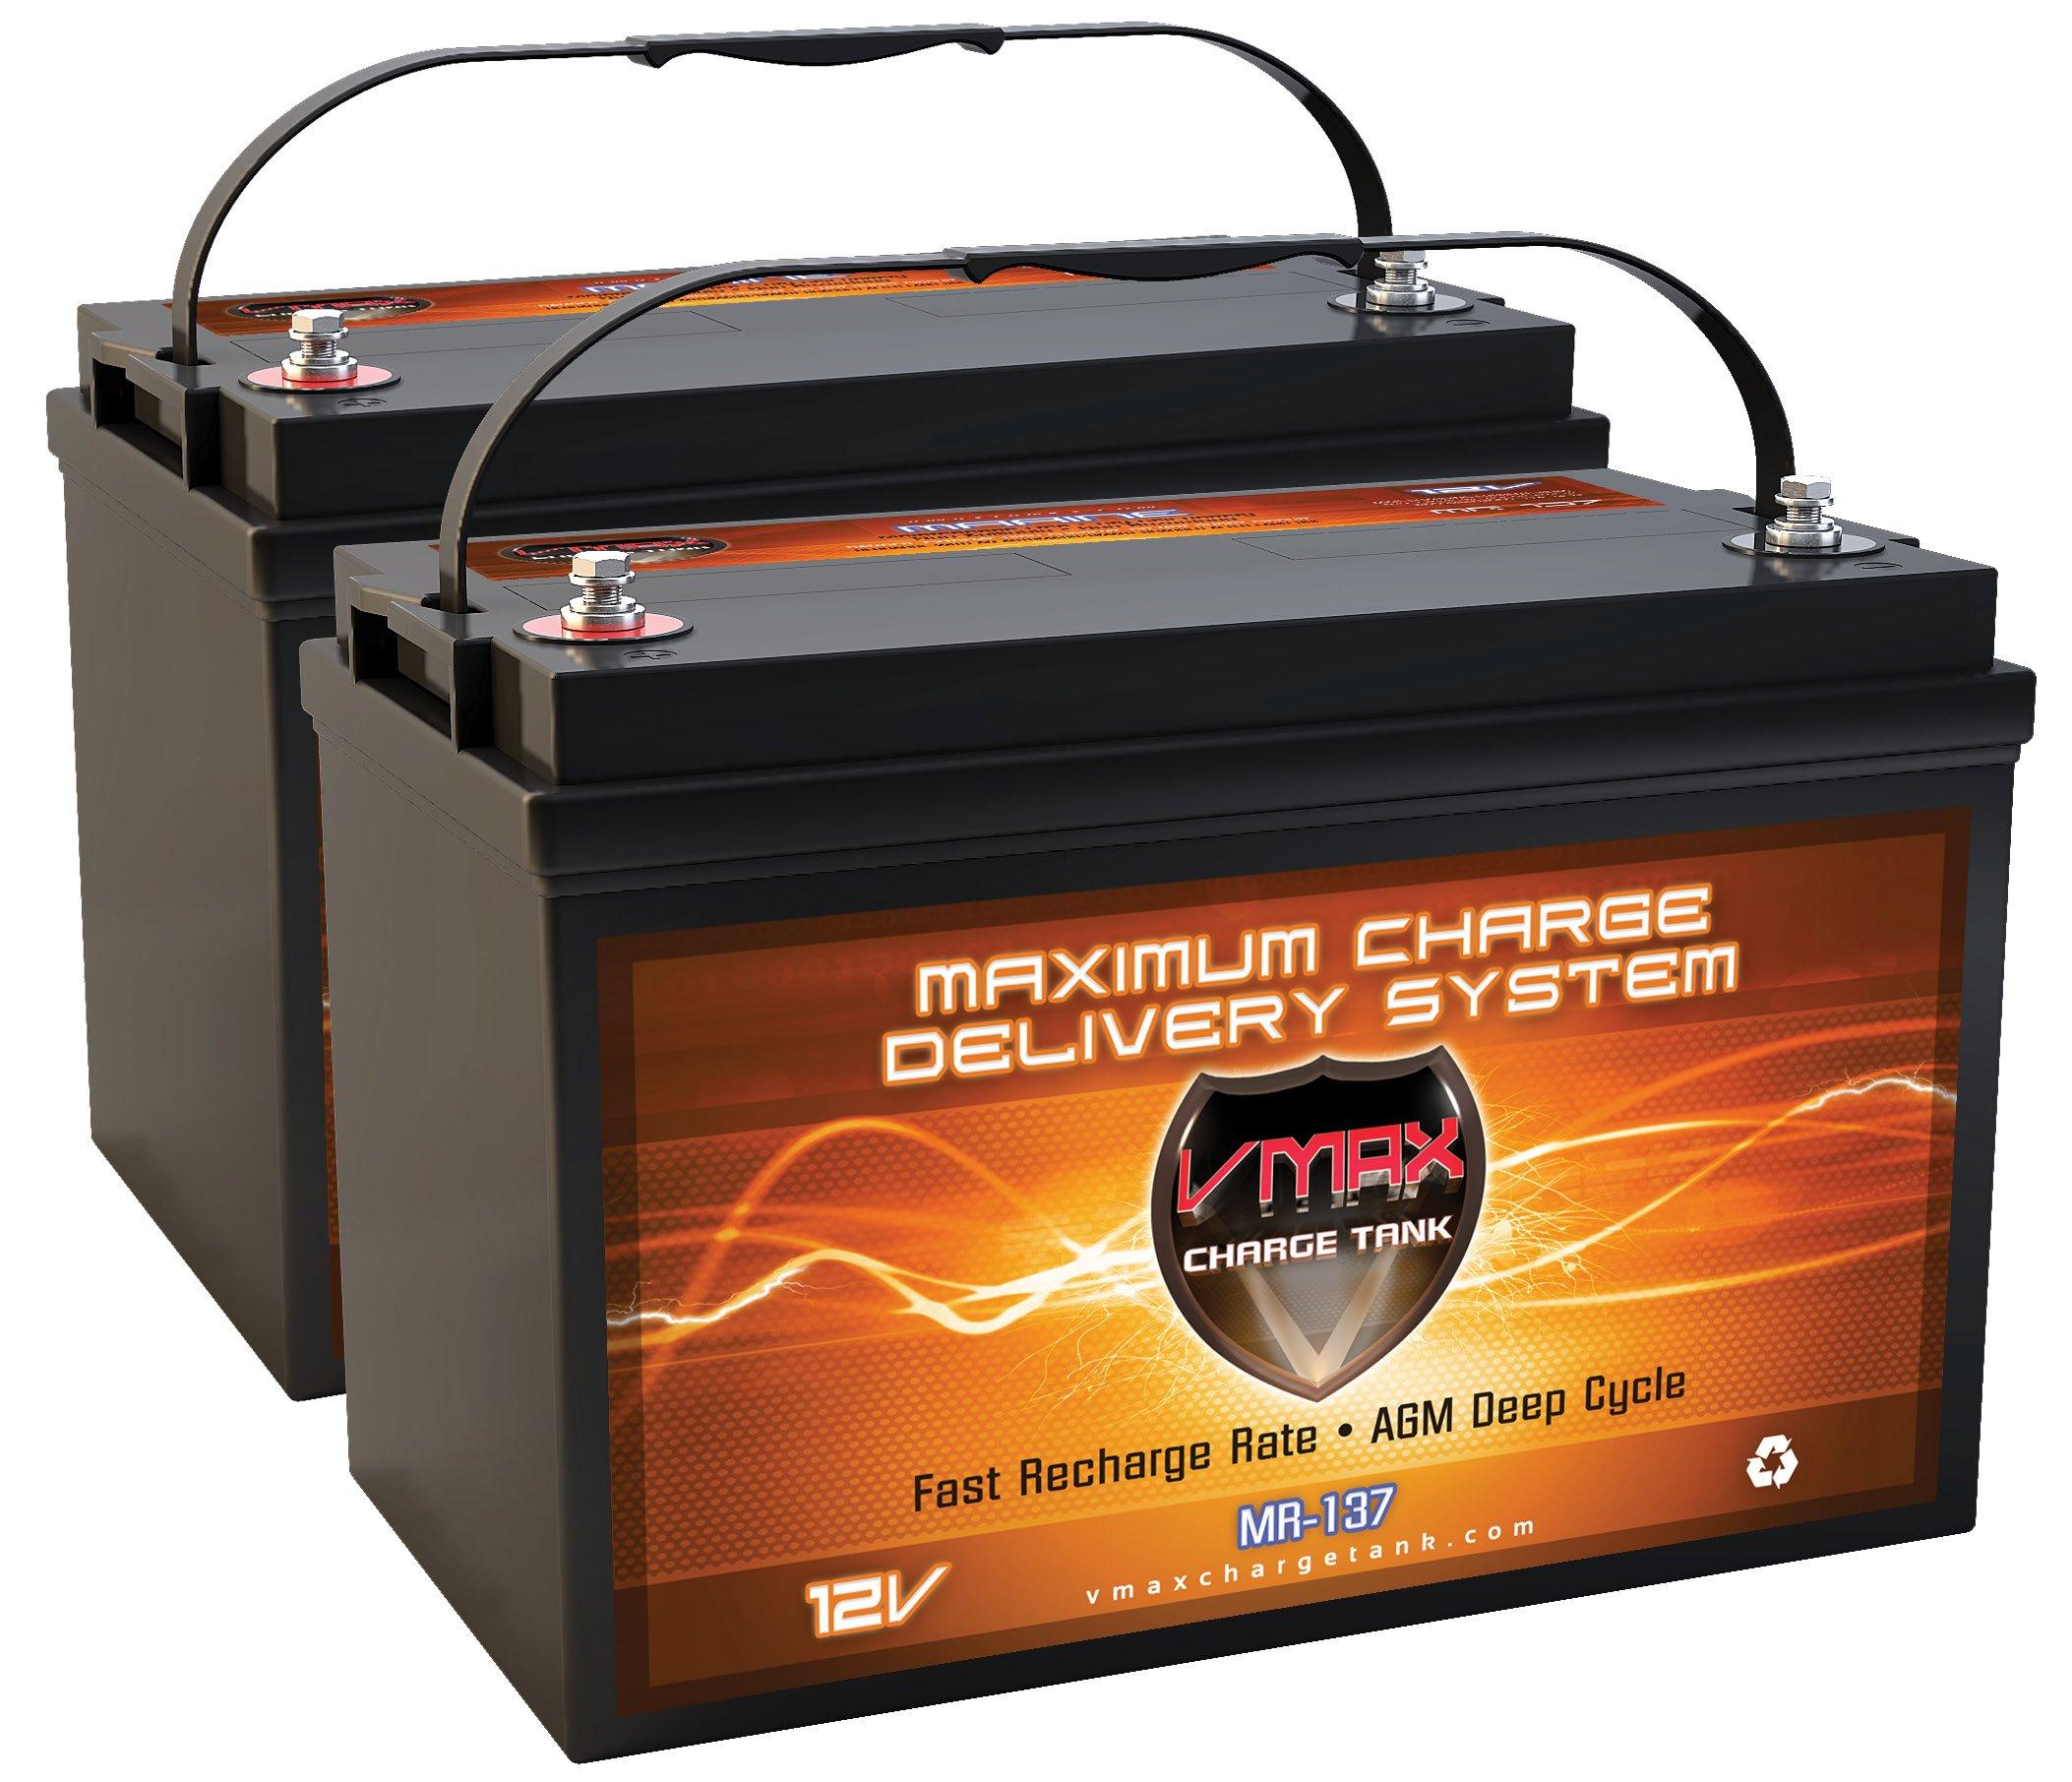 QTY2 VMAX MR137-120 12V 120AH AGM Deep Cycle Group 31 Batteries for Minn Kota Riptide RT80/T Saltwater Transom Mount 24V 80lb Trolling Motor